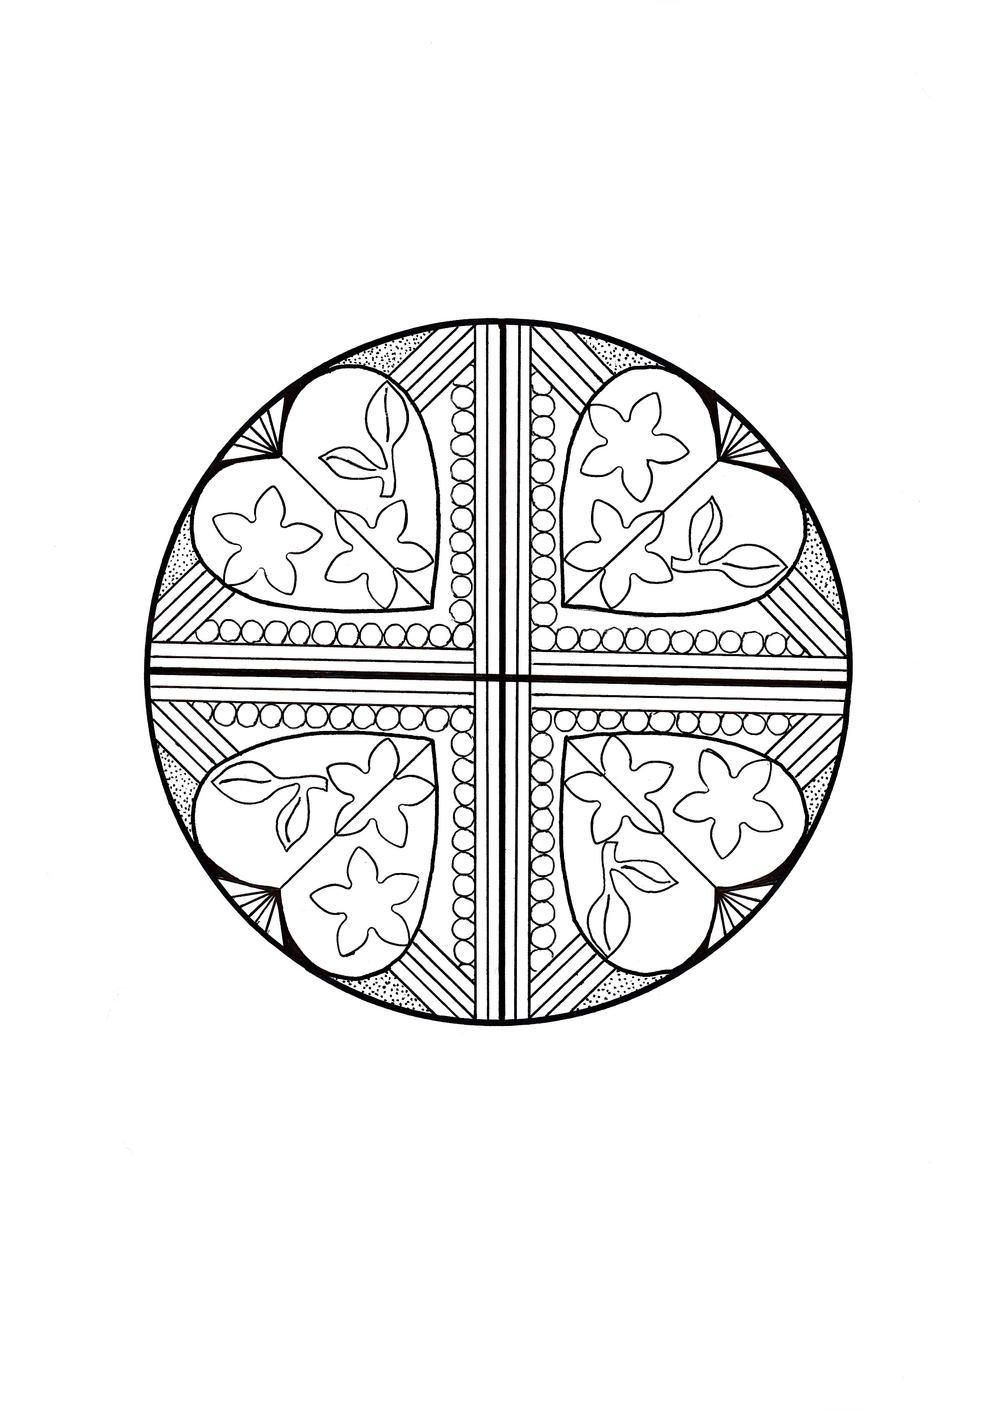 Heart Quartet Mandala Coloring Page | Mandala coloring, Mandala and ...